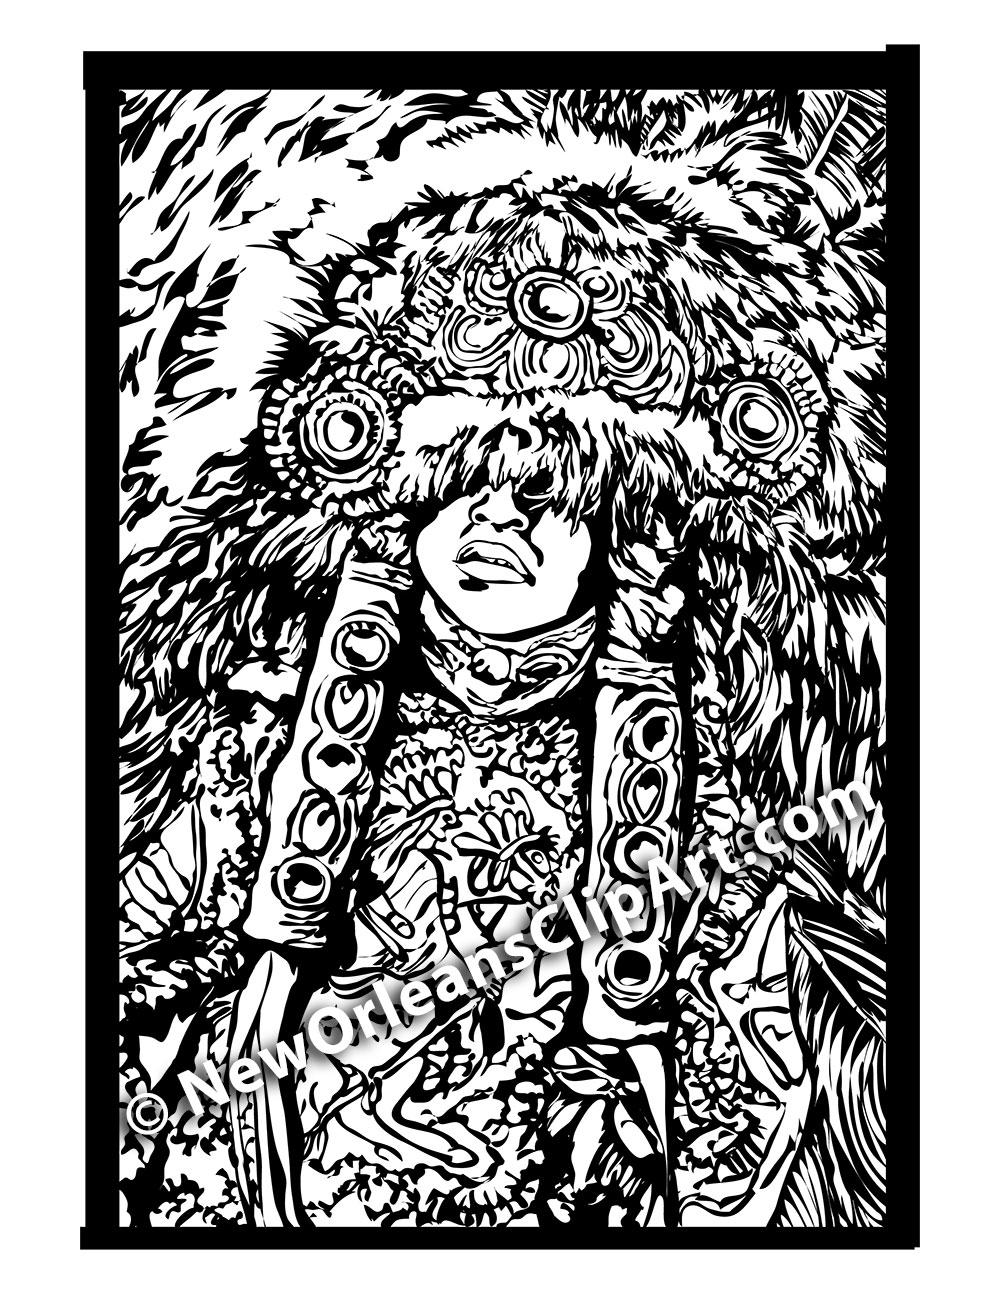 New Orleans Black & White Mardi Gras Indian Clip Art.